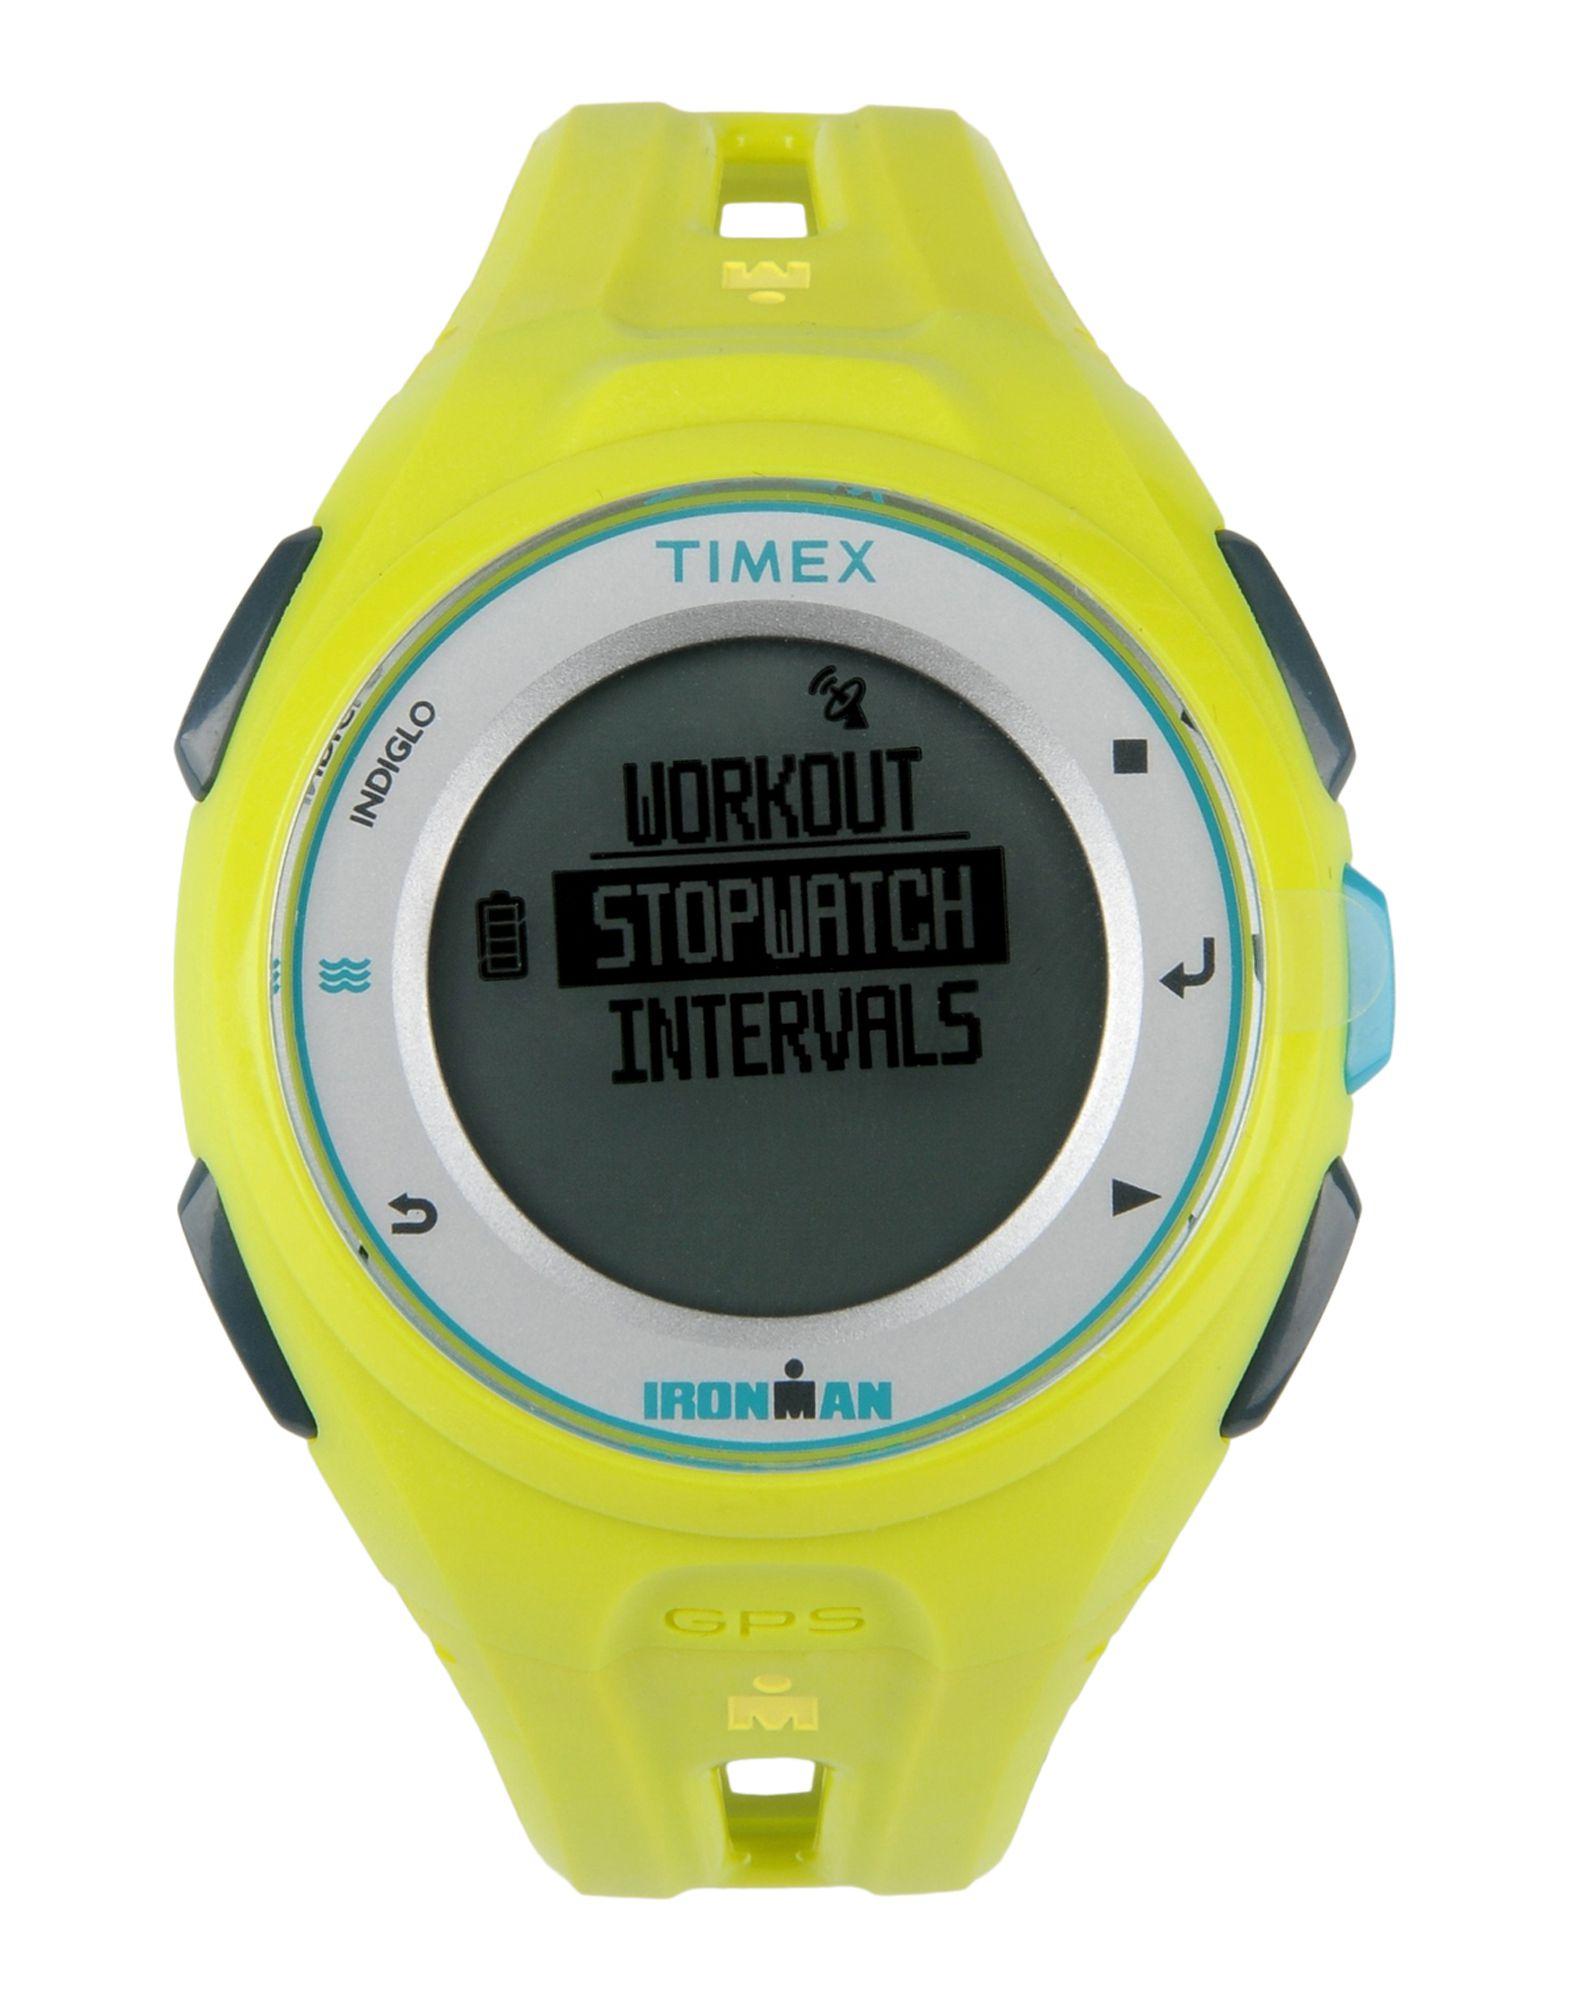 Irm Run X20 - Accessorio Hi-Tech Timex - DESIGN+ART Timex - Acquista online su